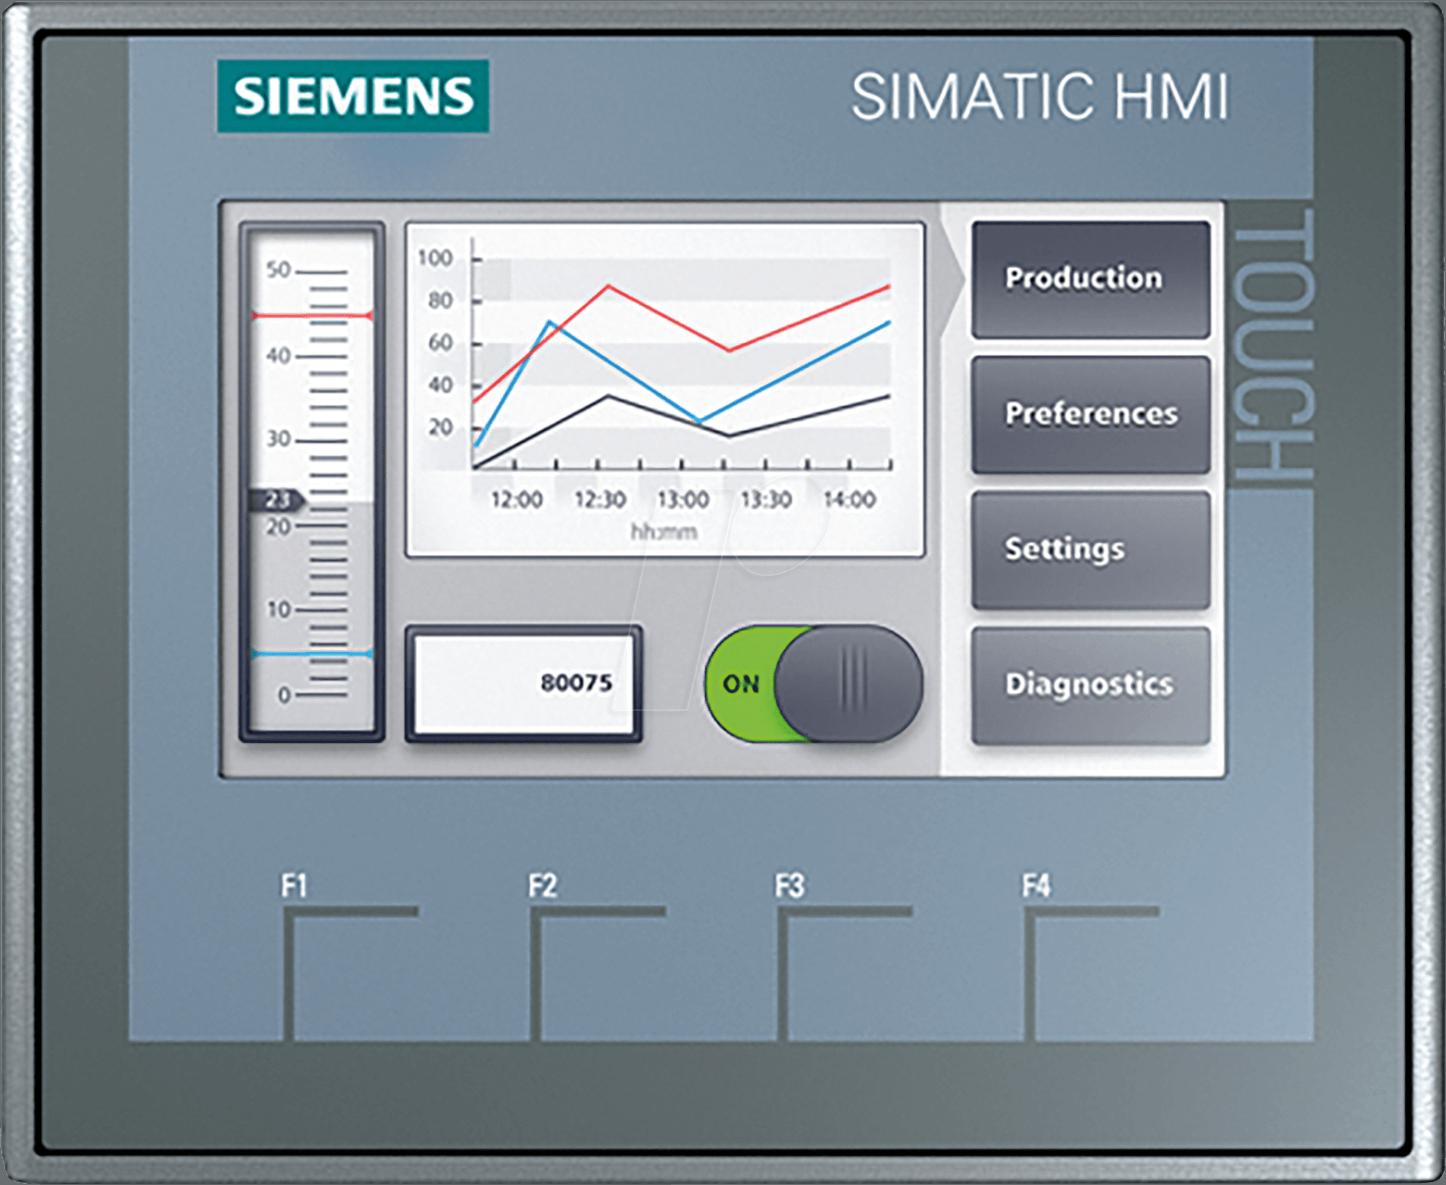 td hmi ktp400 simatic hmi ktp400 basic at reichelt elektronik